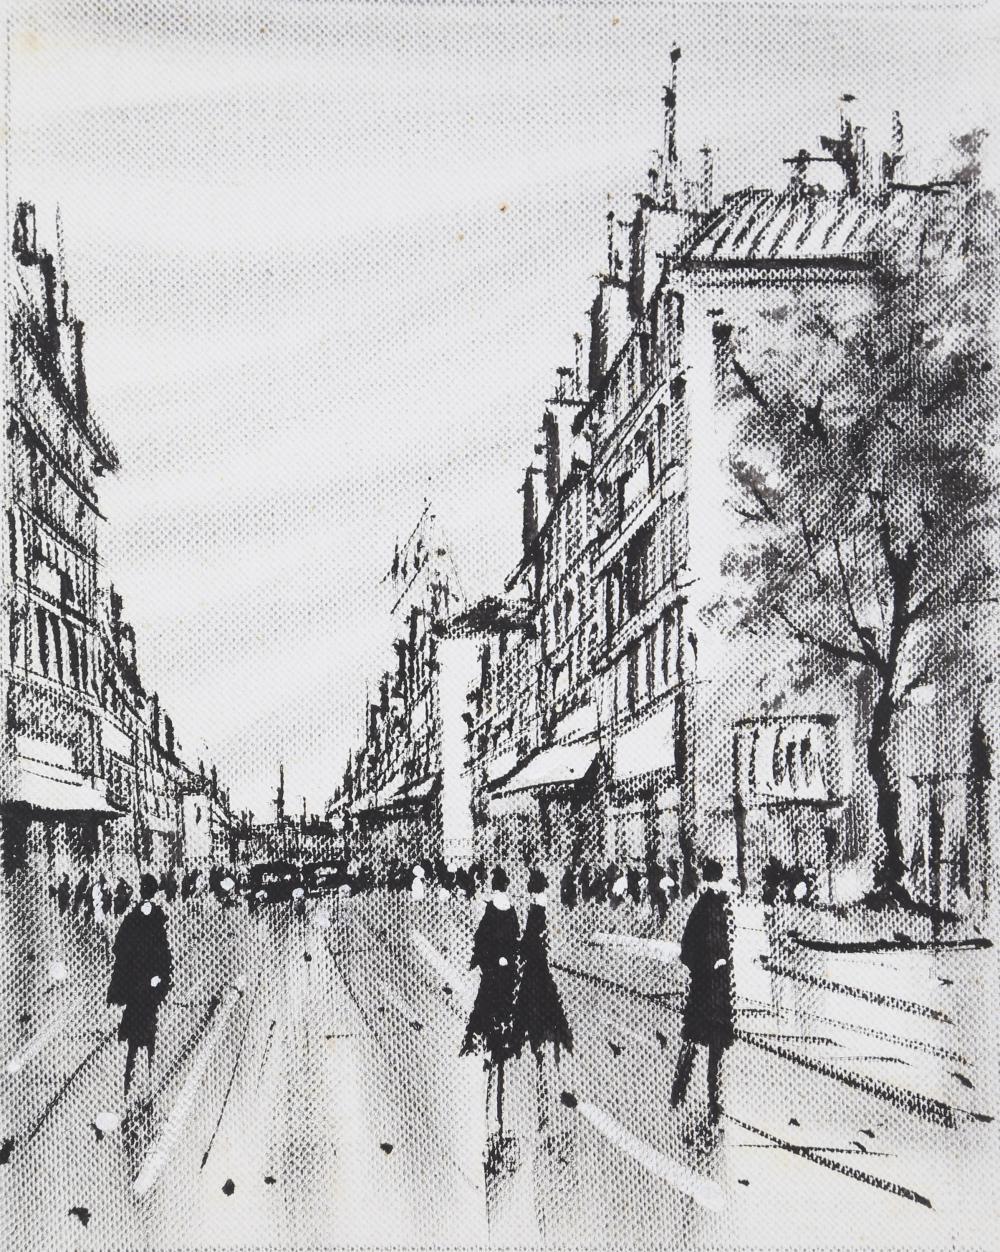 Barnet, City 8, Oil Painting